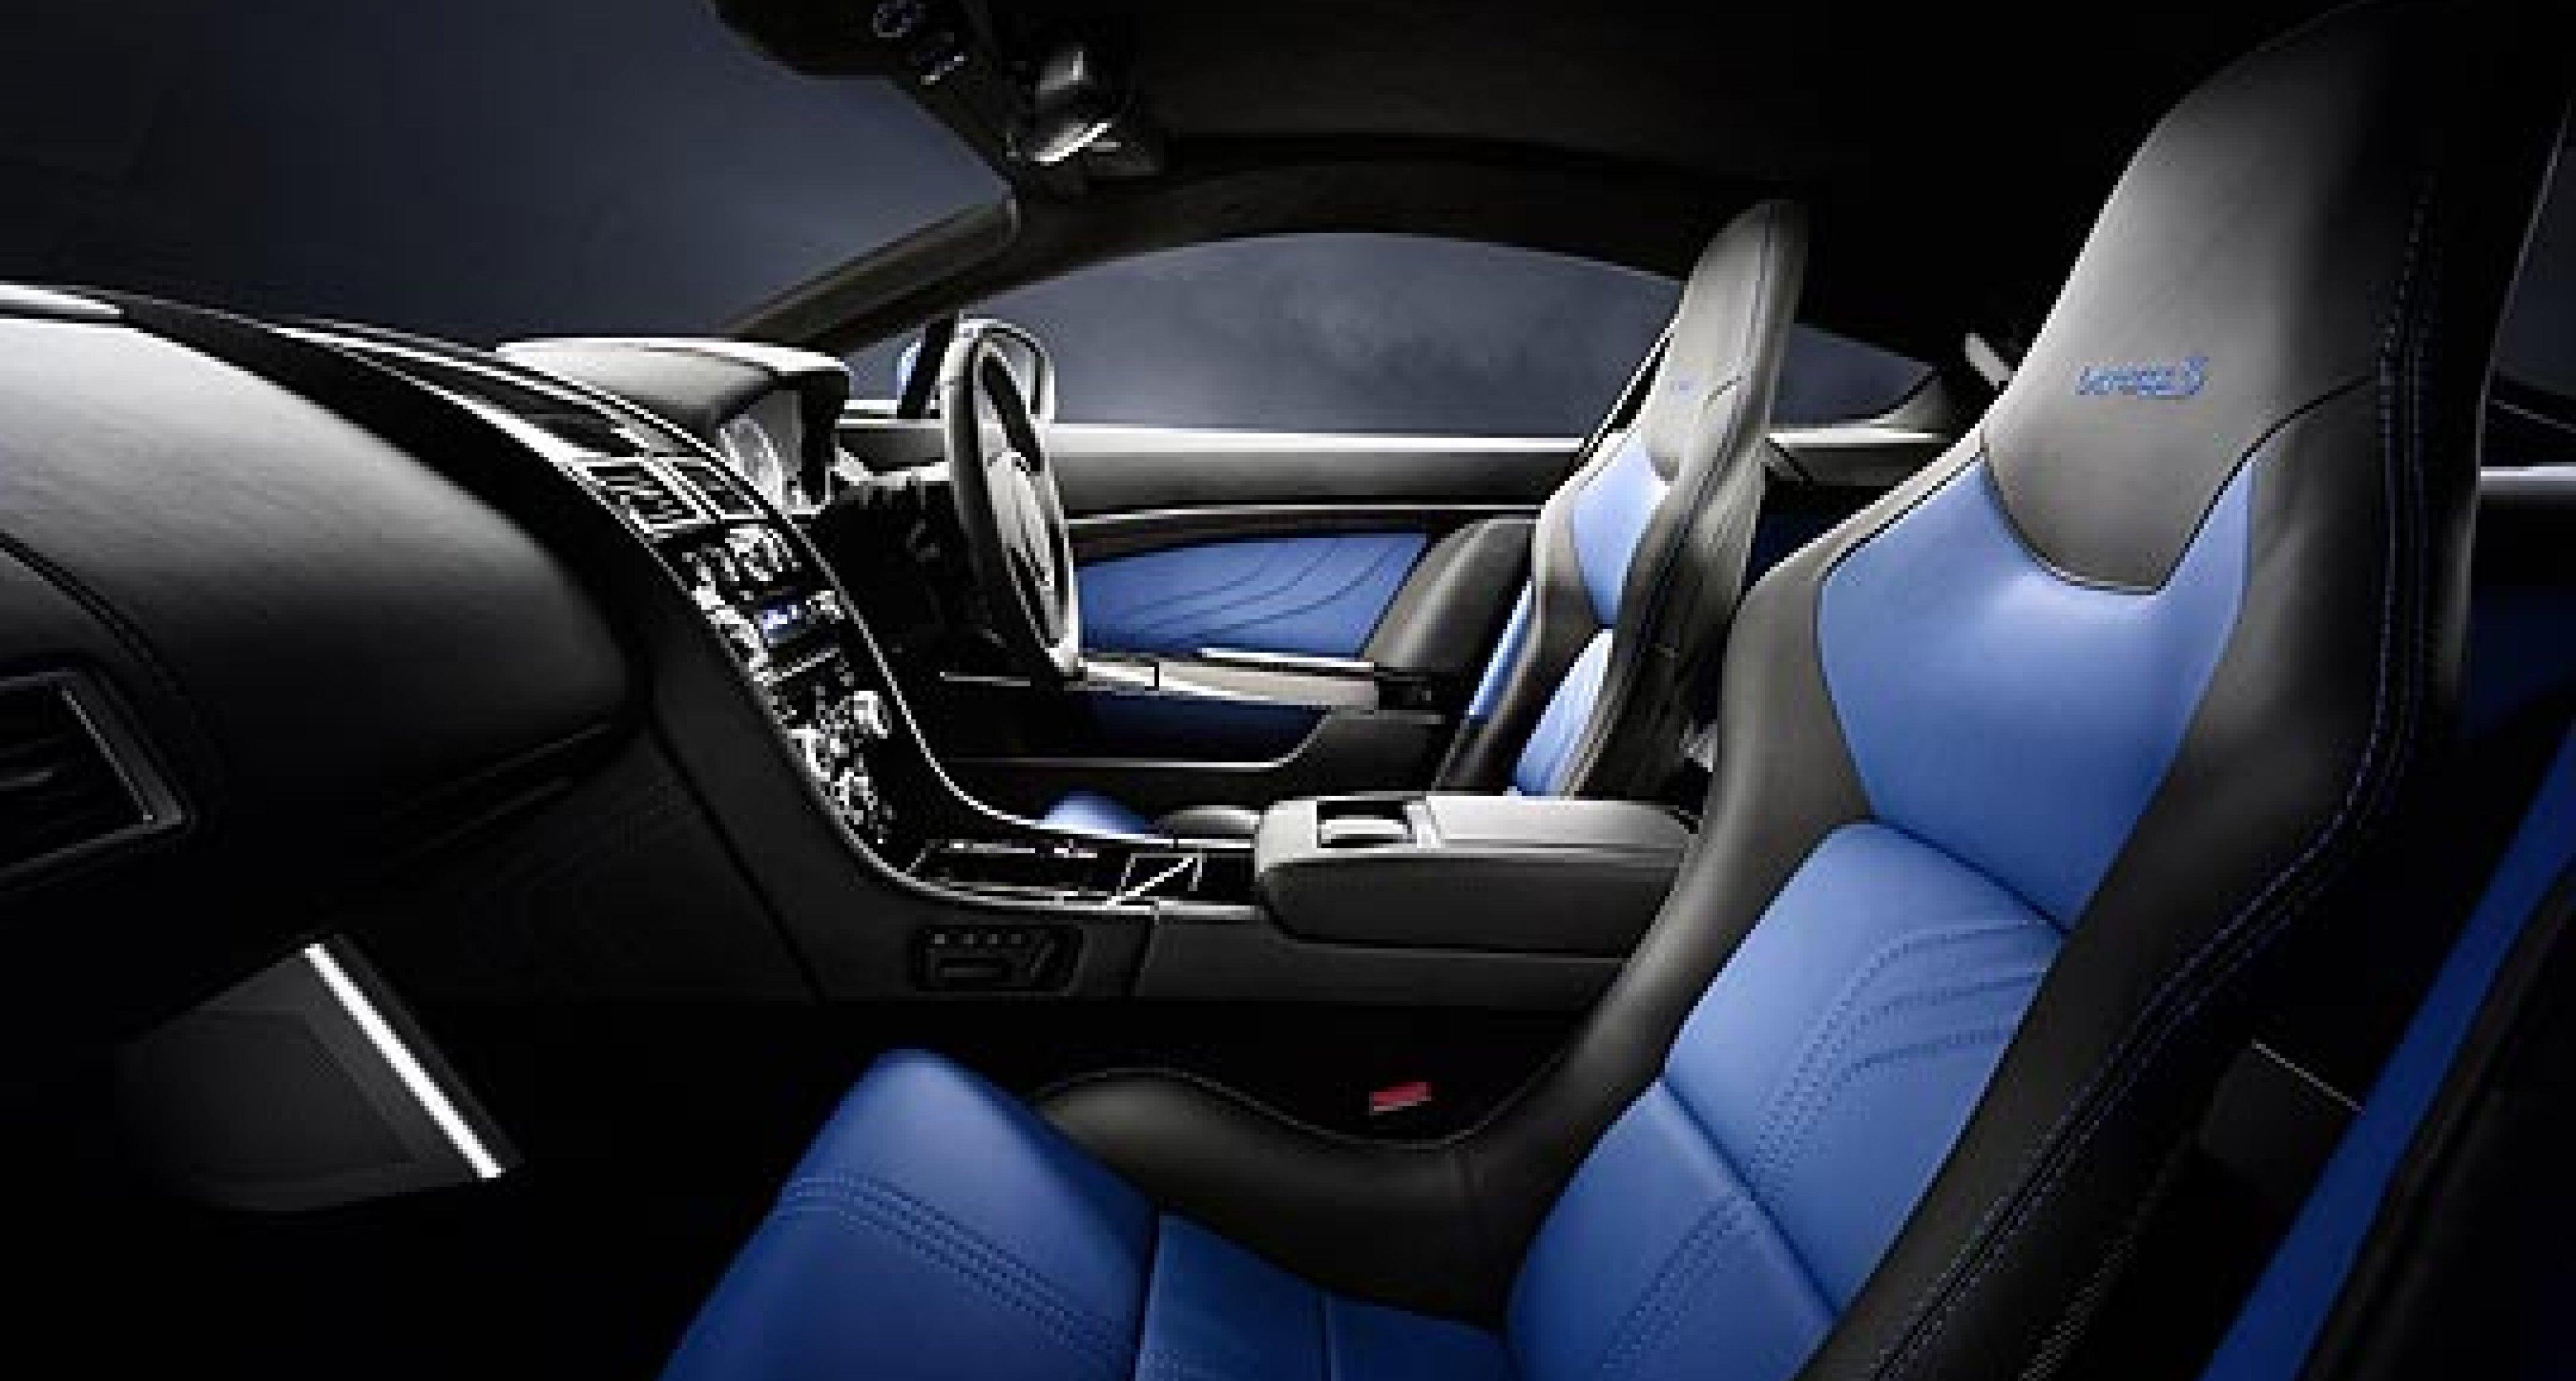 New for 2011: The Aston Martin V8 Vantage S